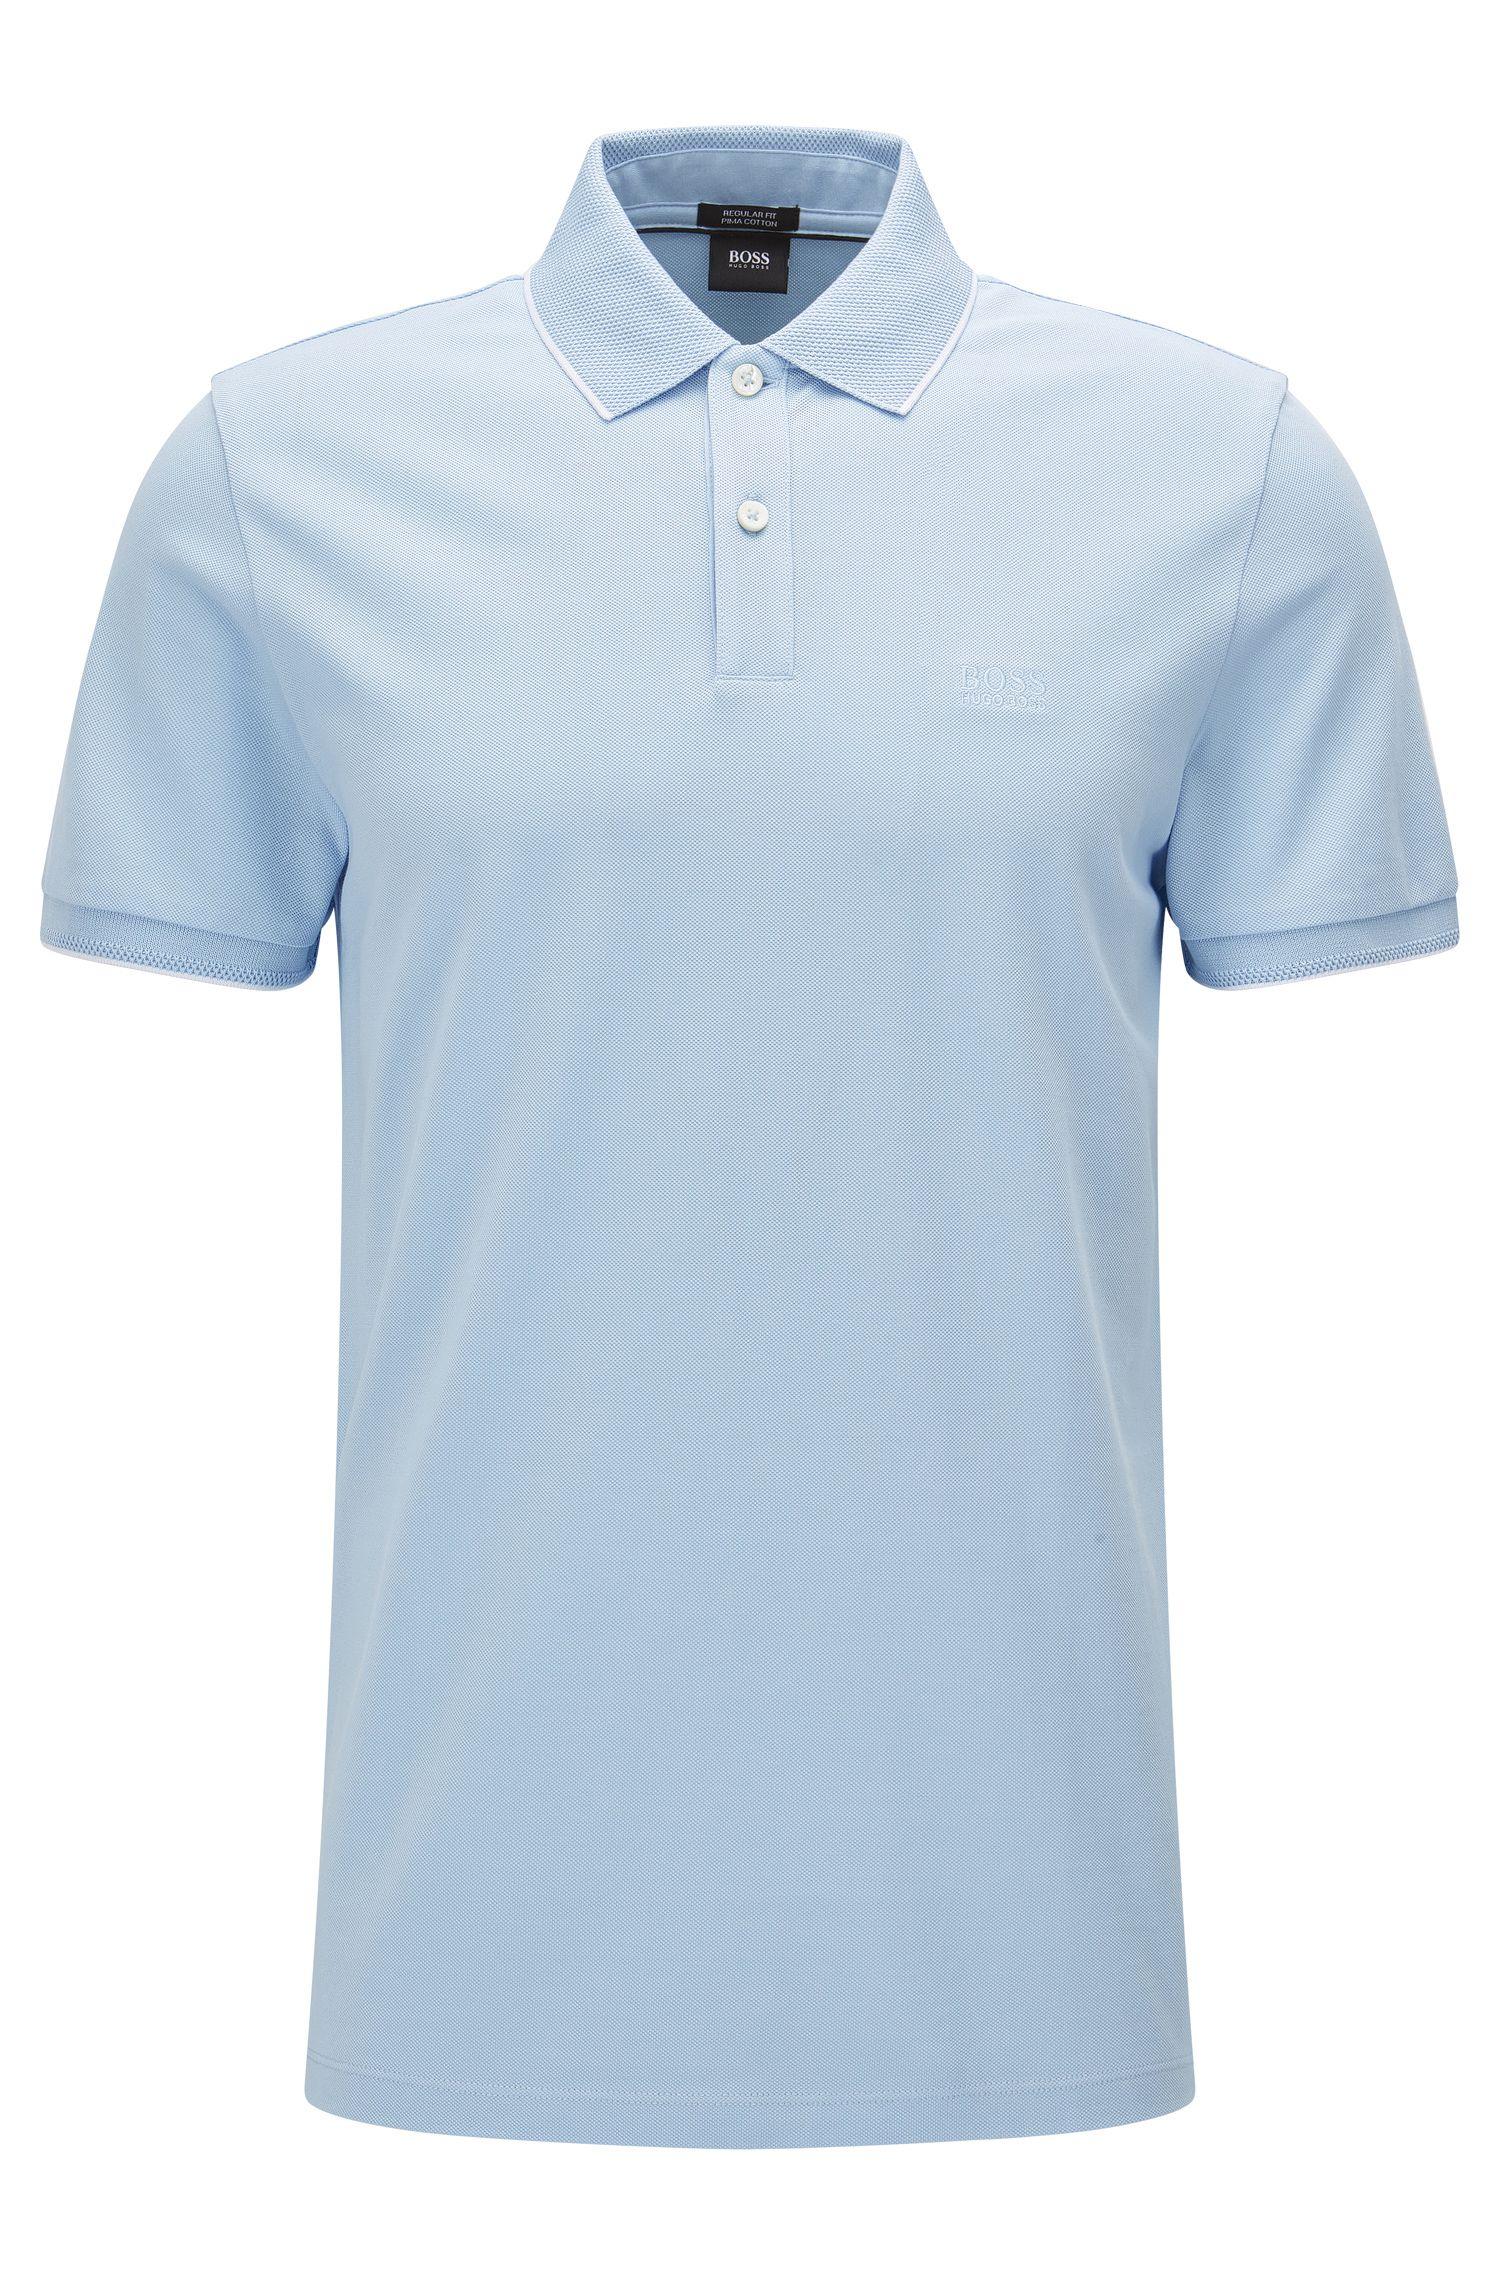 Polo in cotone regular fit con motivi a contrasto